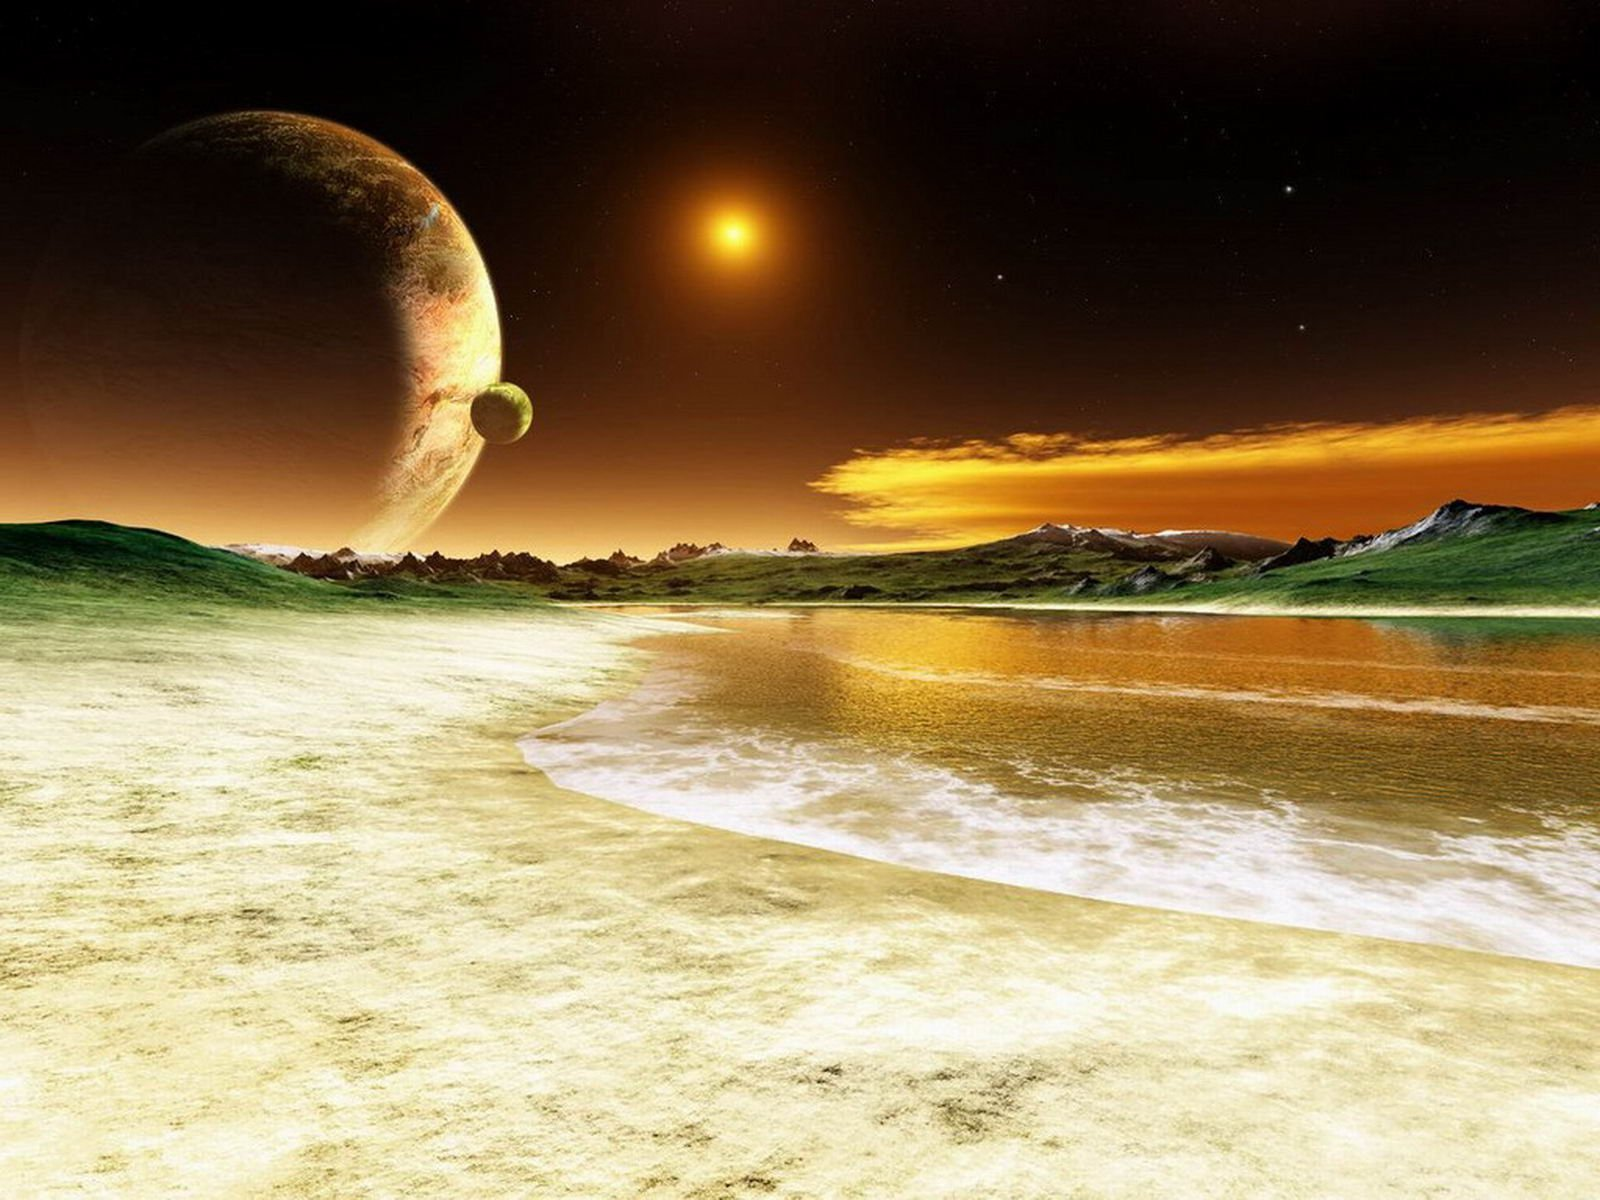 desktop hd wallpapers: top 33 real and unbelievable planet